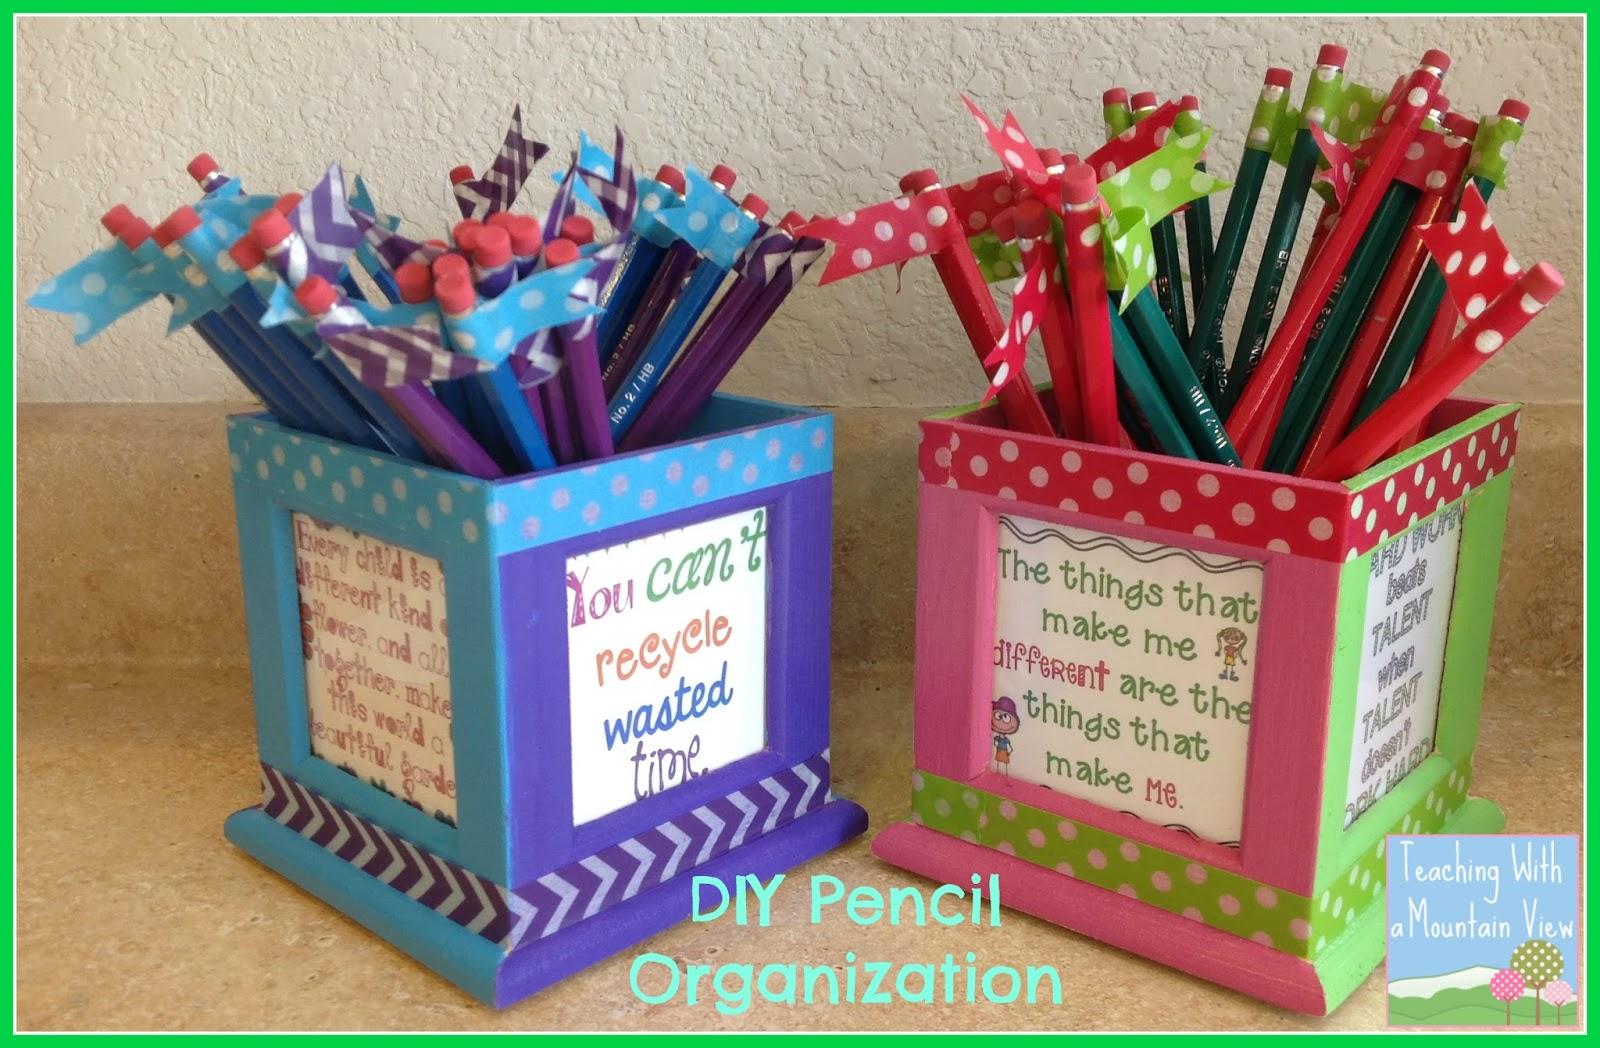 Teaching With A Mountain View Diy Pencil Organizer